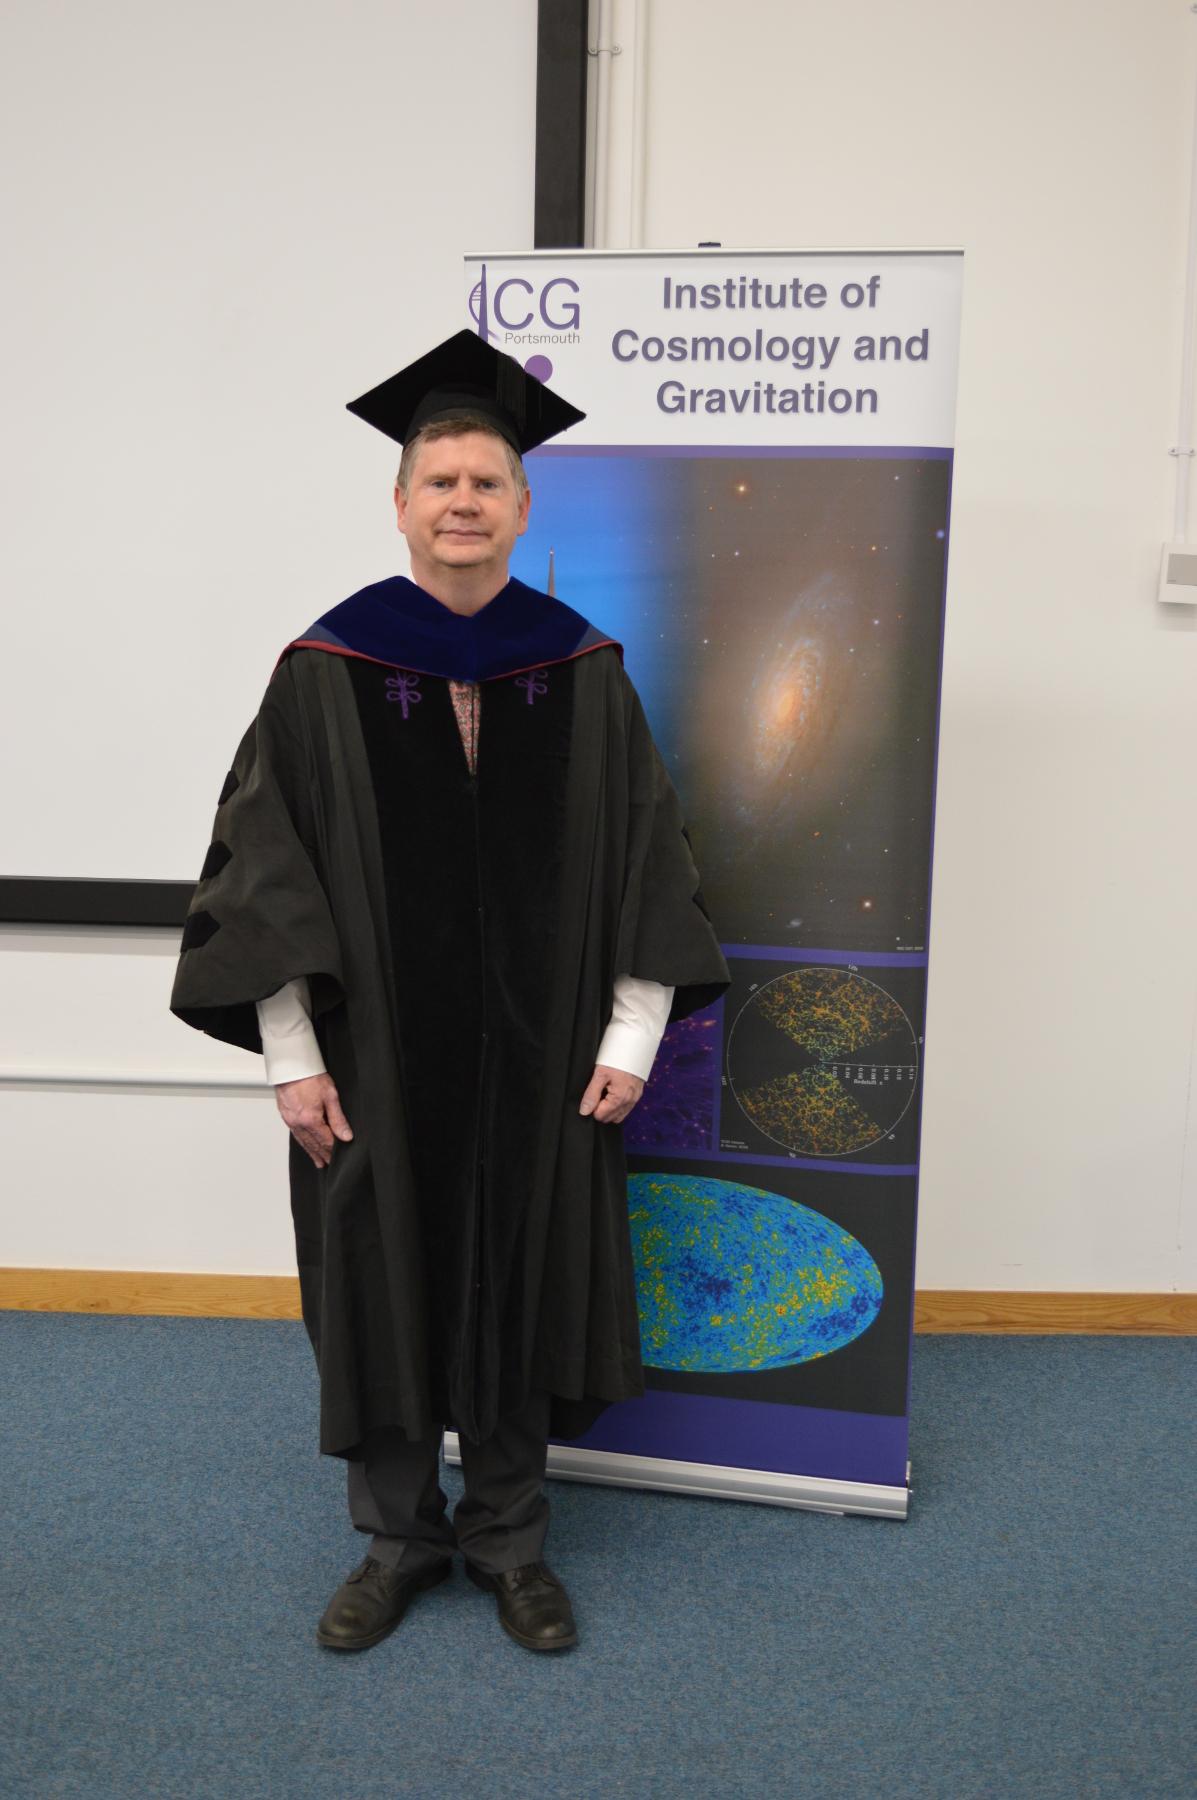 Professor Rob Crittenden